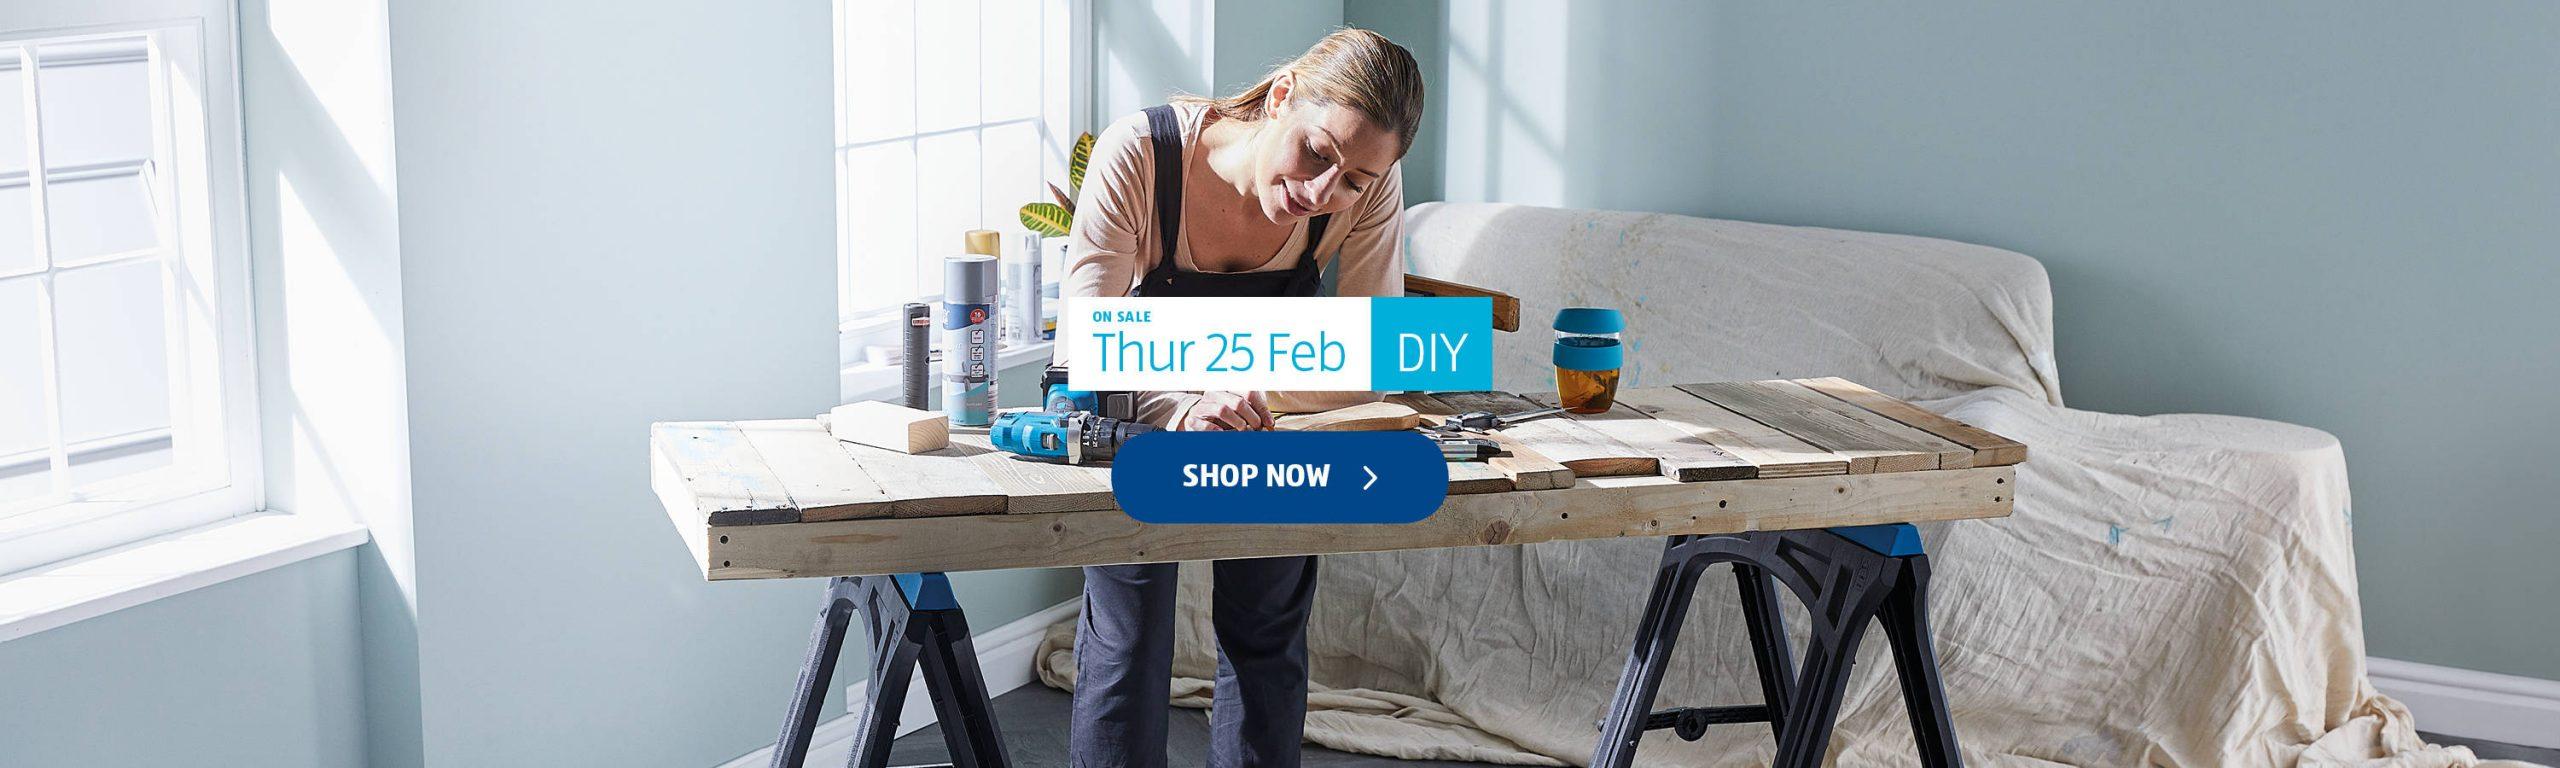 ALDI DIY 25th February 2021 ALDI Thursday Offers